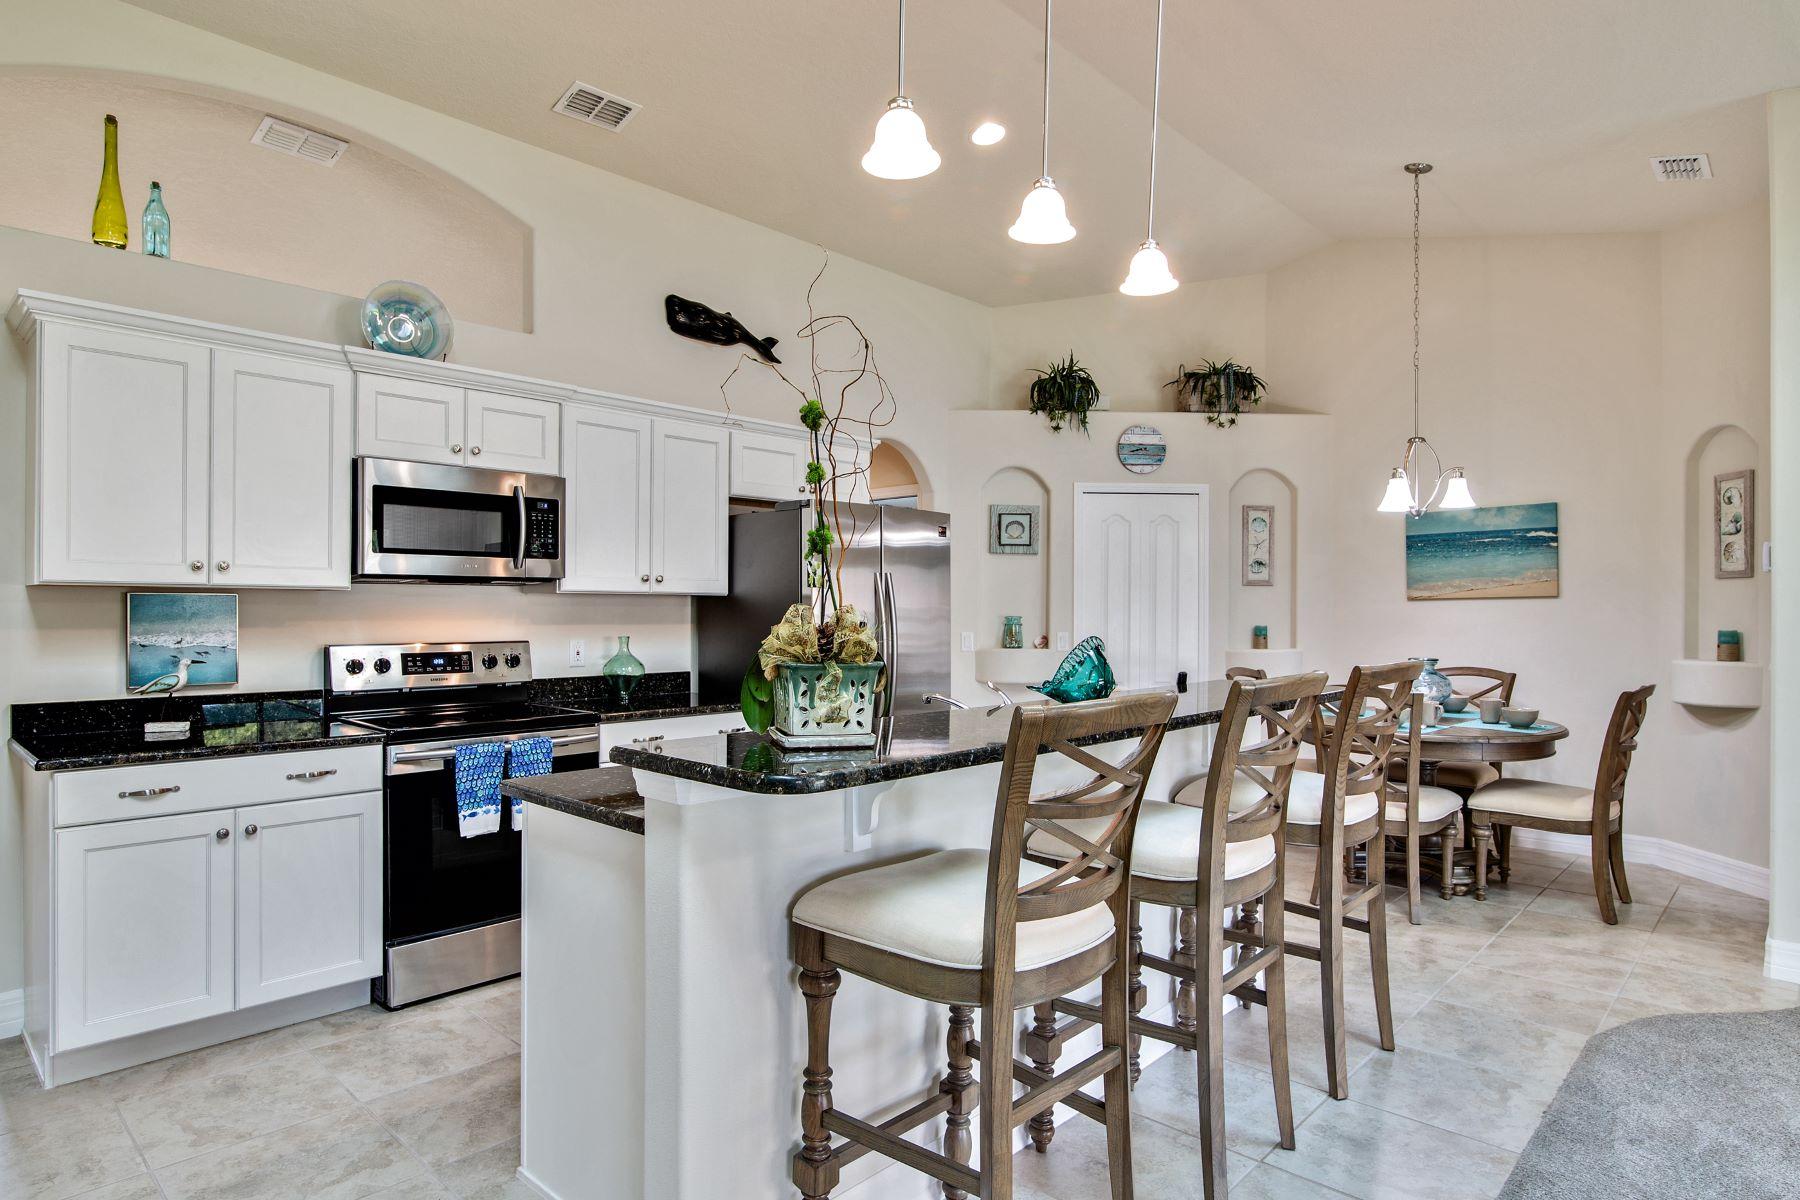 Single Family Home for Sale at Eau Gallie Shores 545 Jackson Avenue Unit B Satellite Beach, Florida 32937 United States